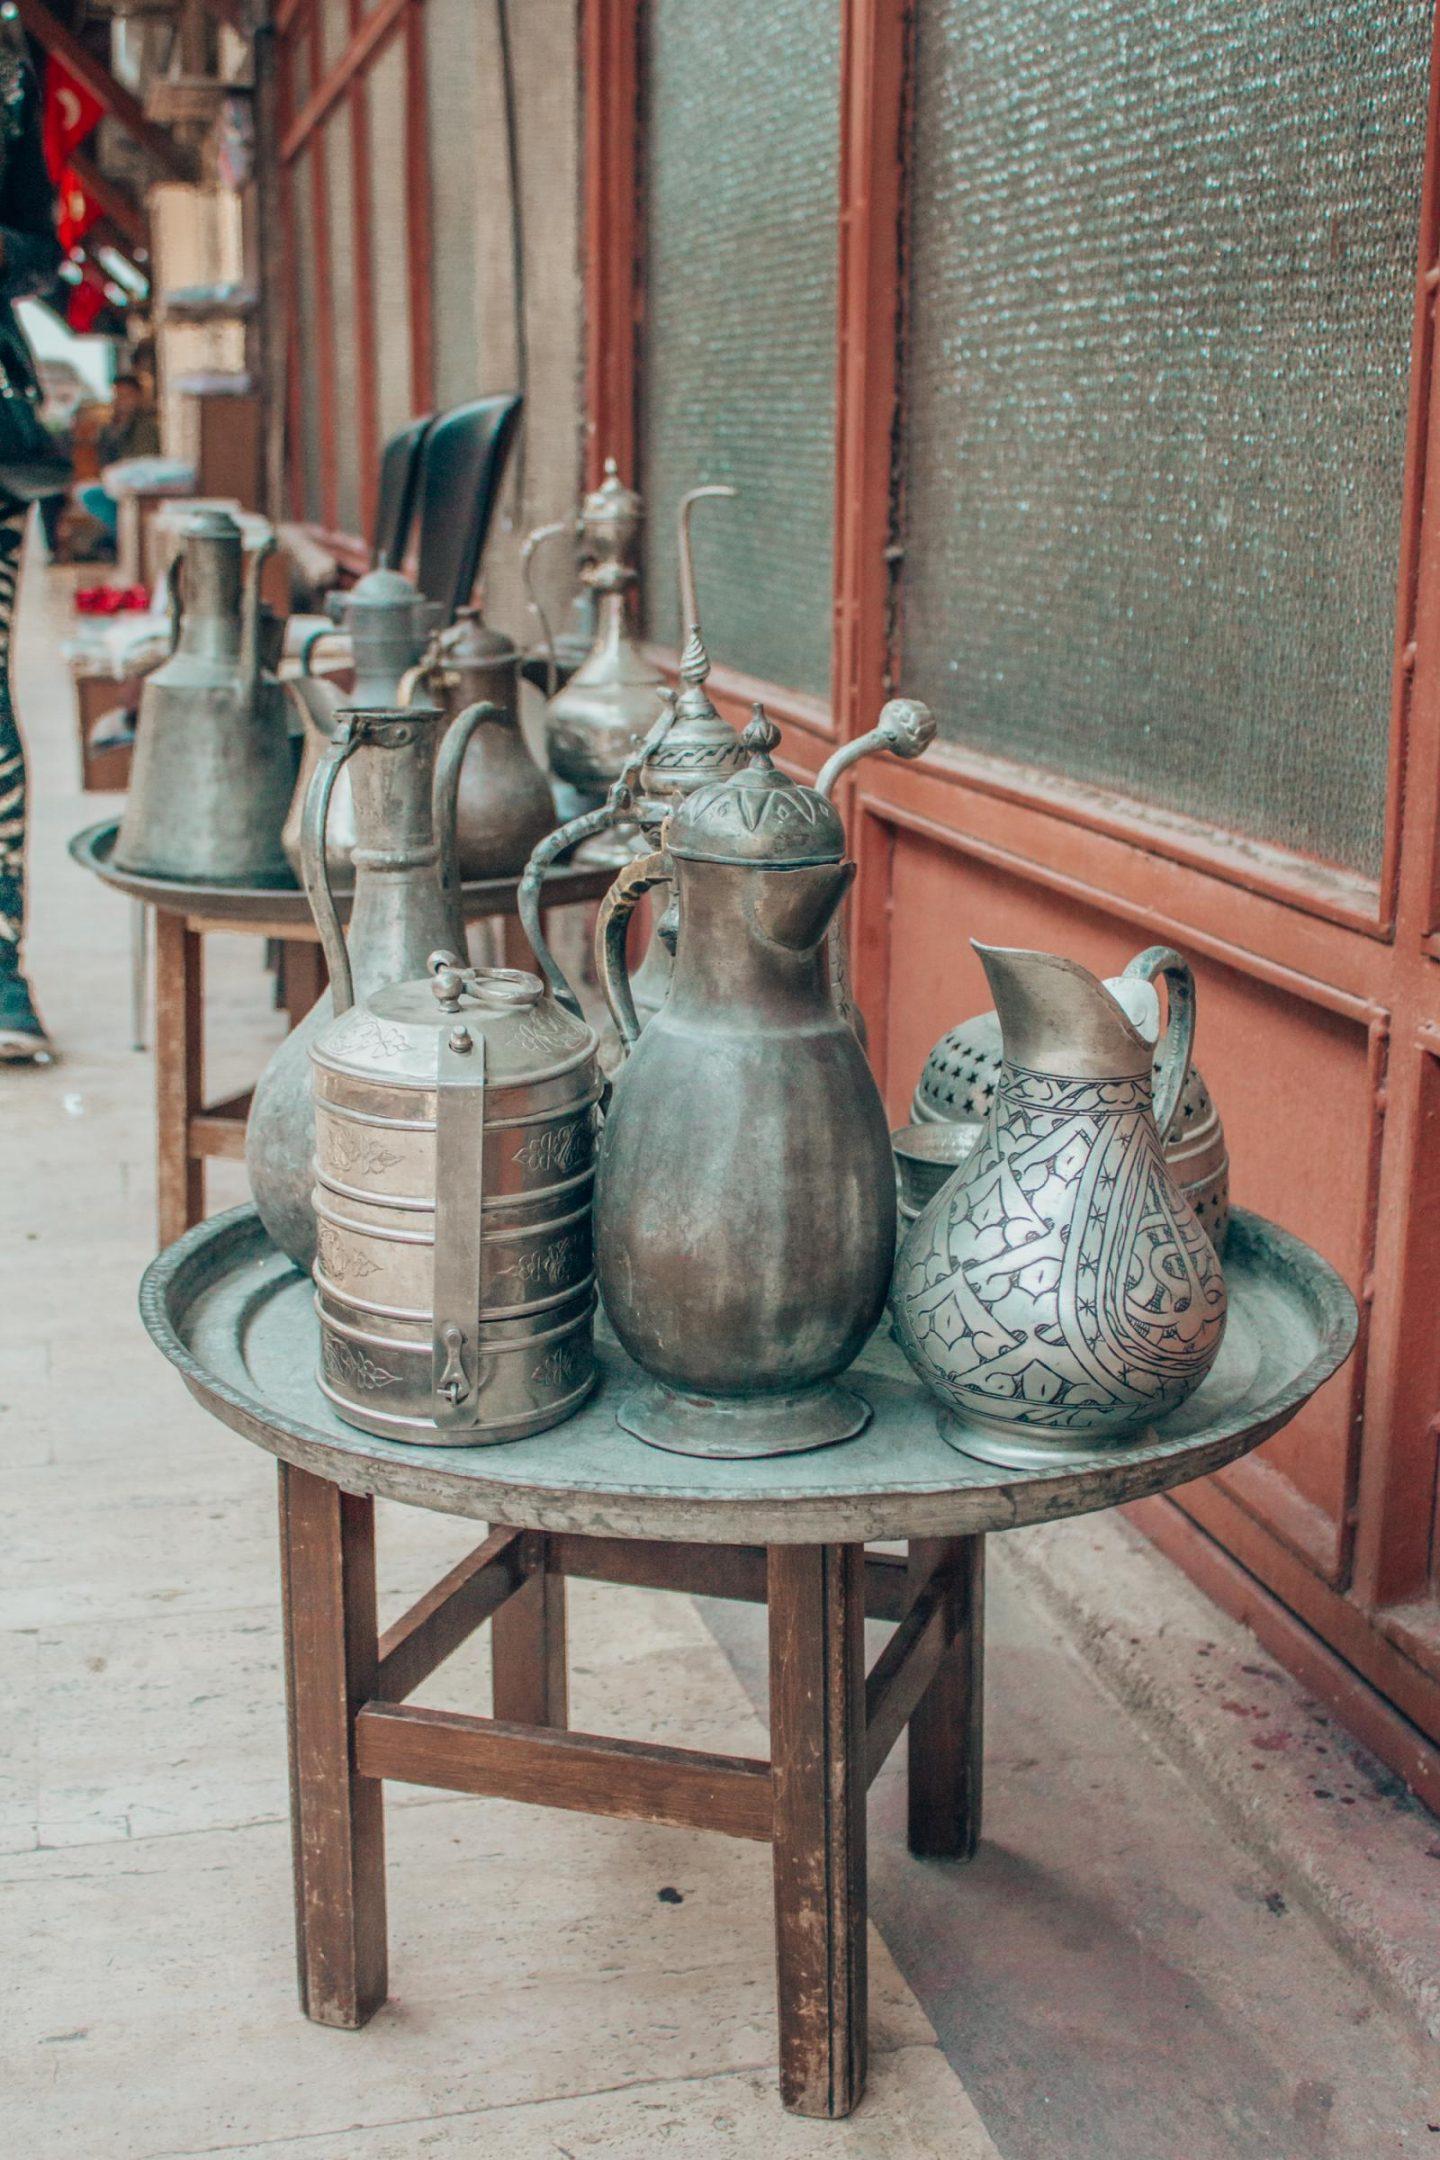 Istanbul Itinerary - Grand Bazaar